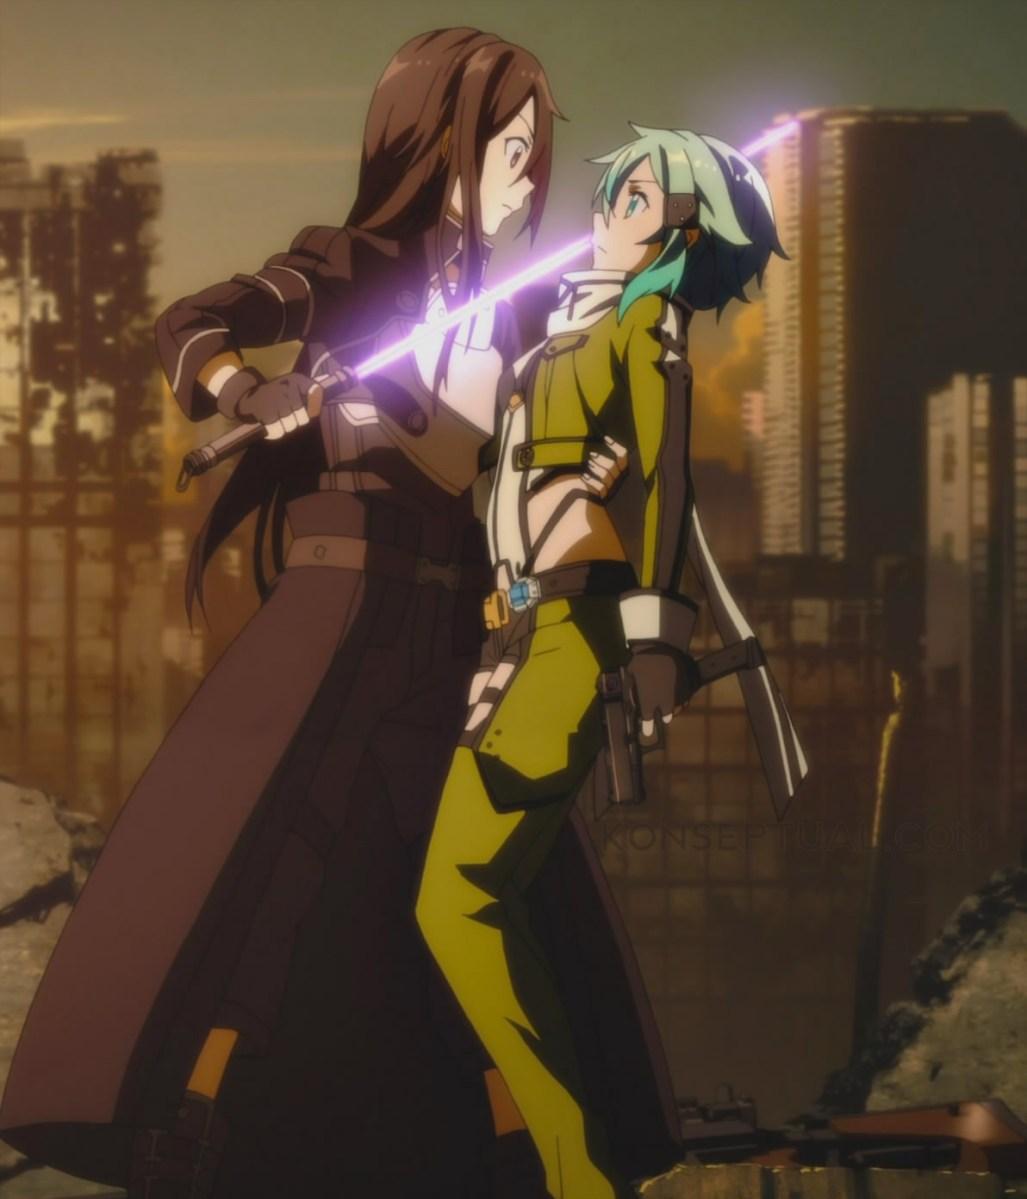 Sword art online ii episode 06 kirito embraces hugs sinon lovingly